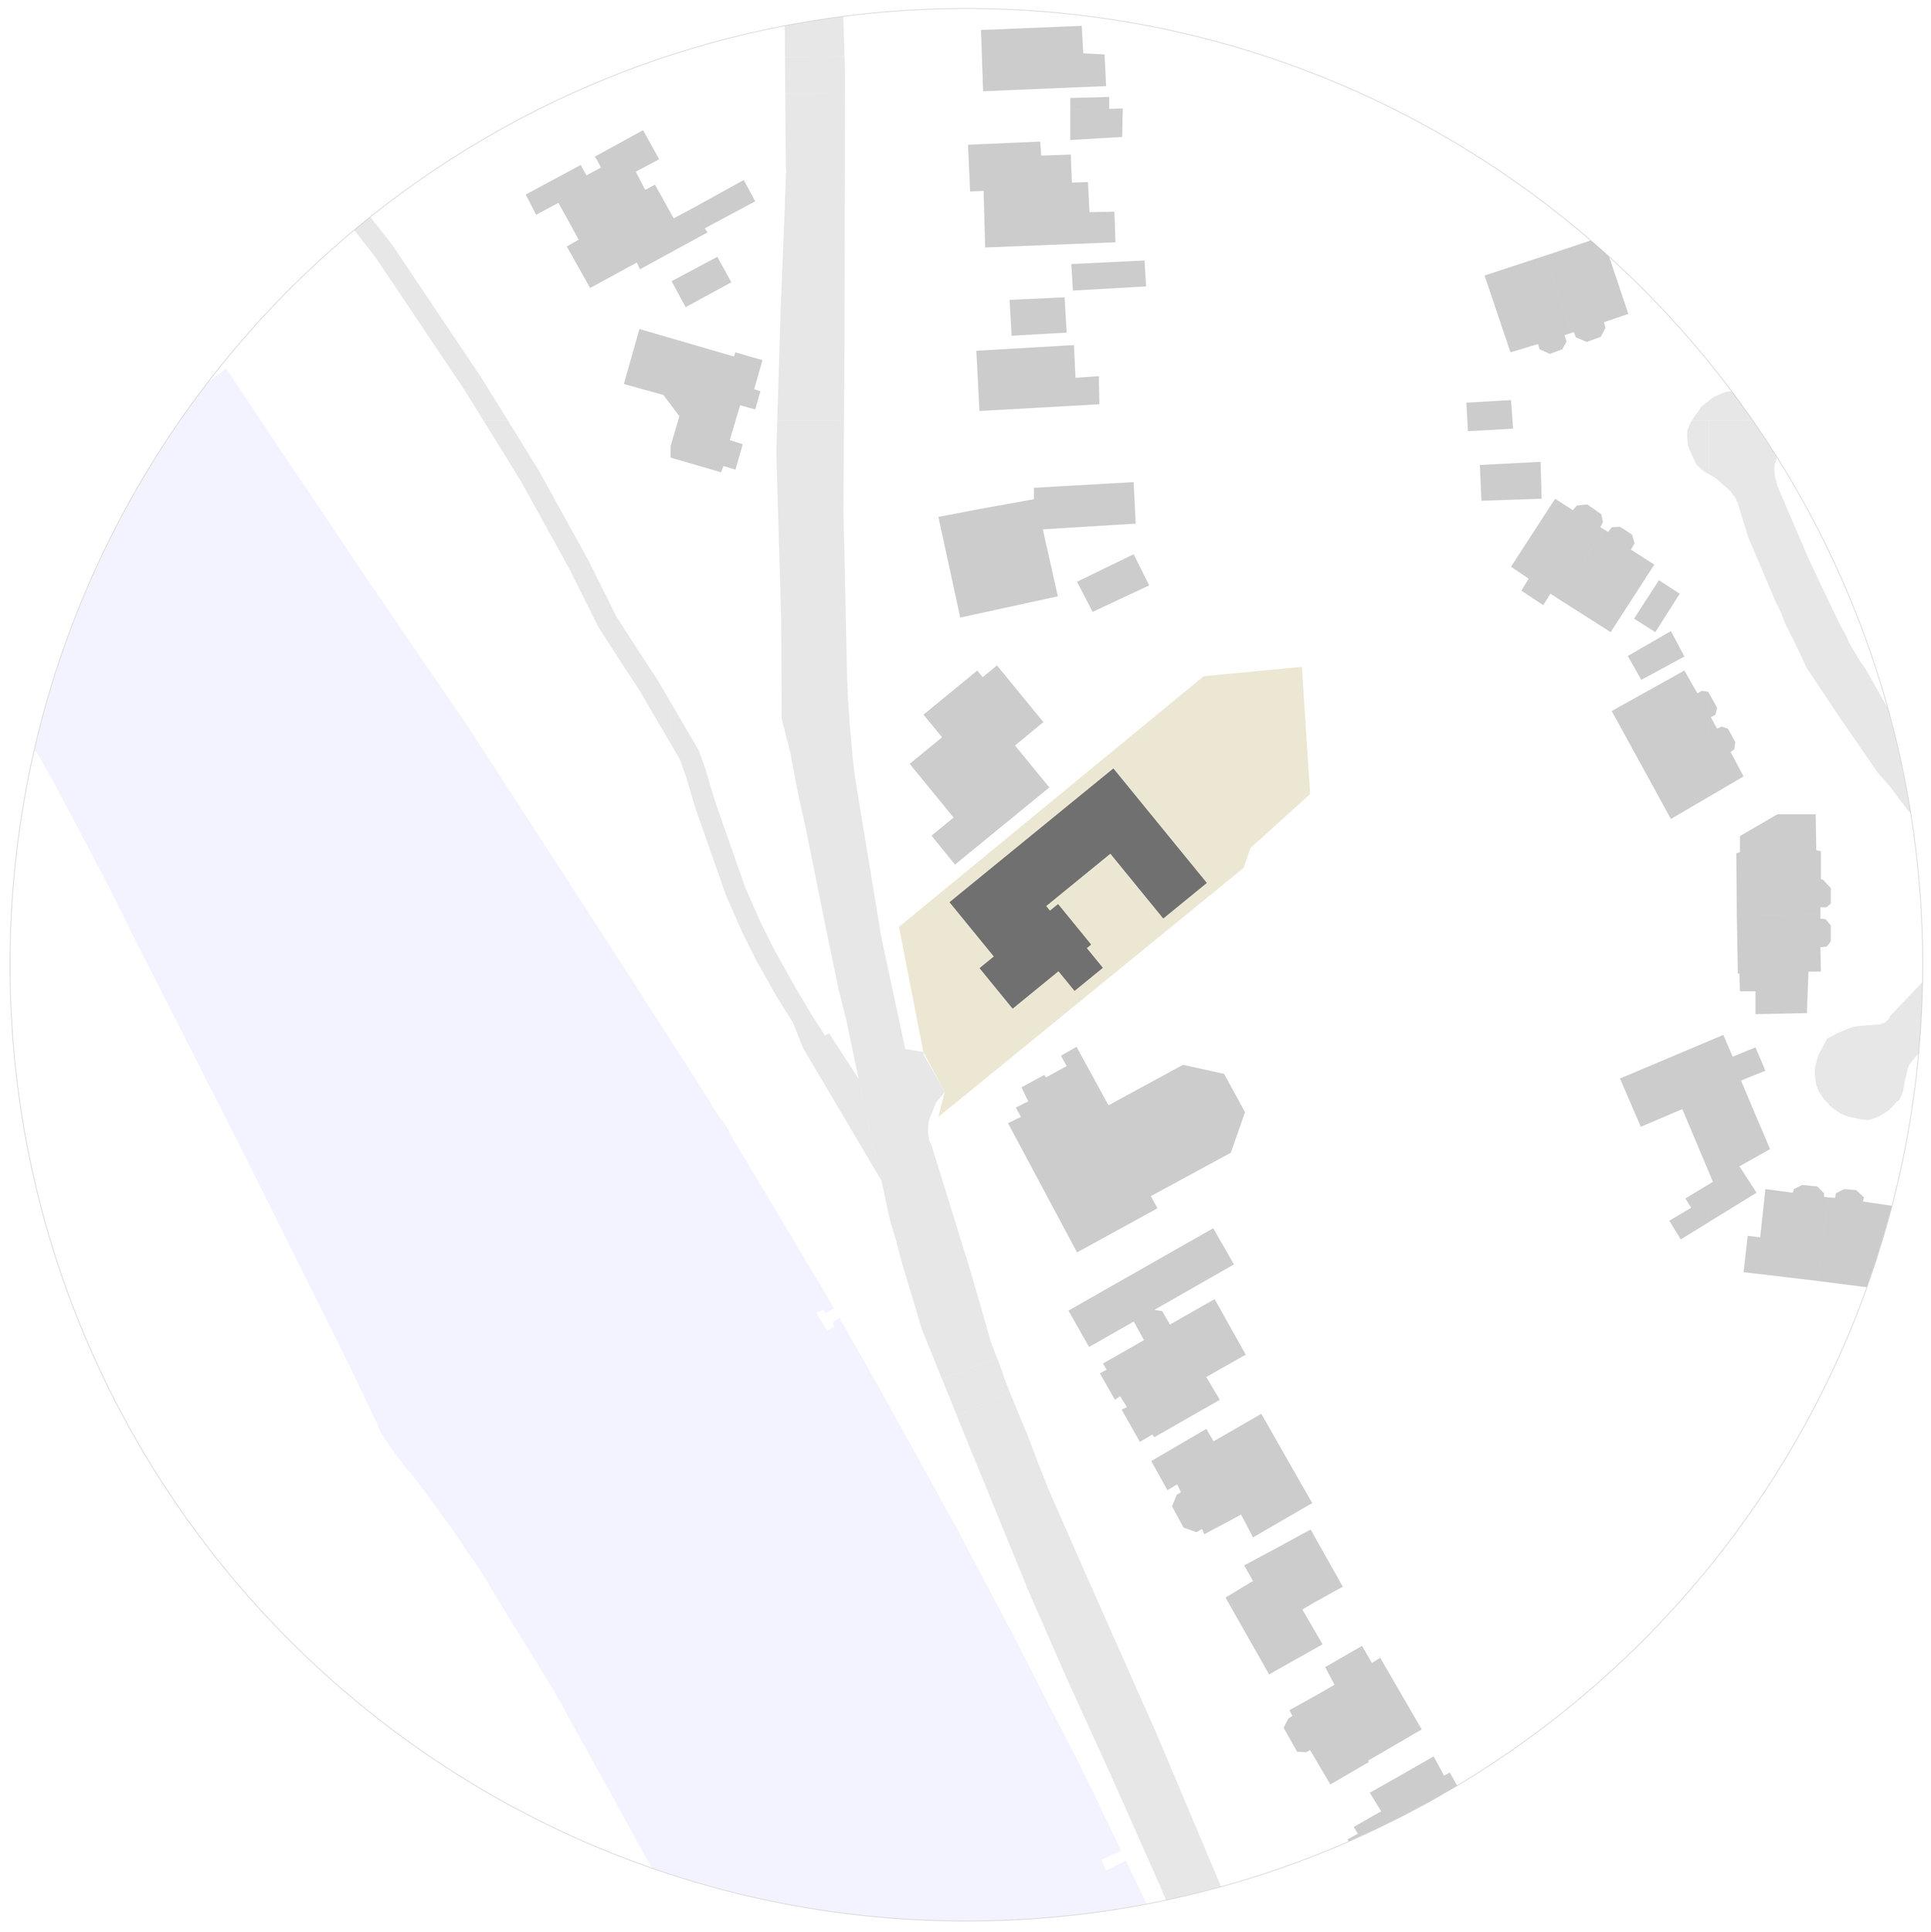 fletcher crane architects, house, kingston, surrey,